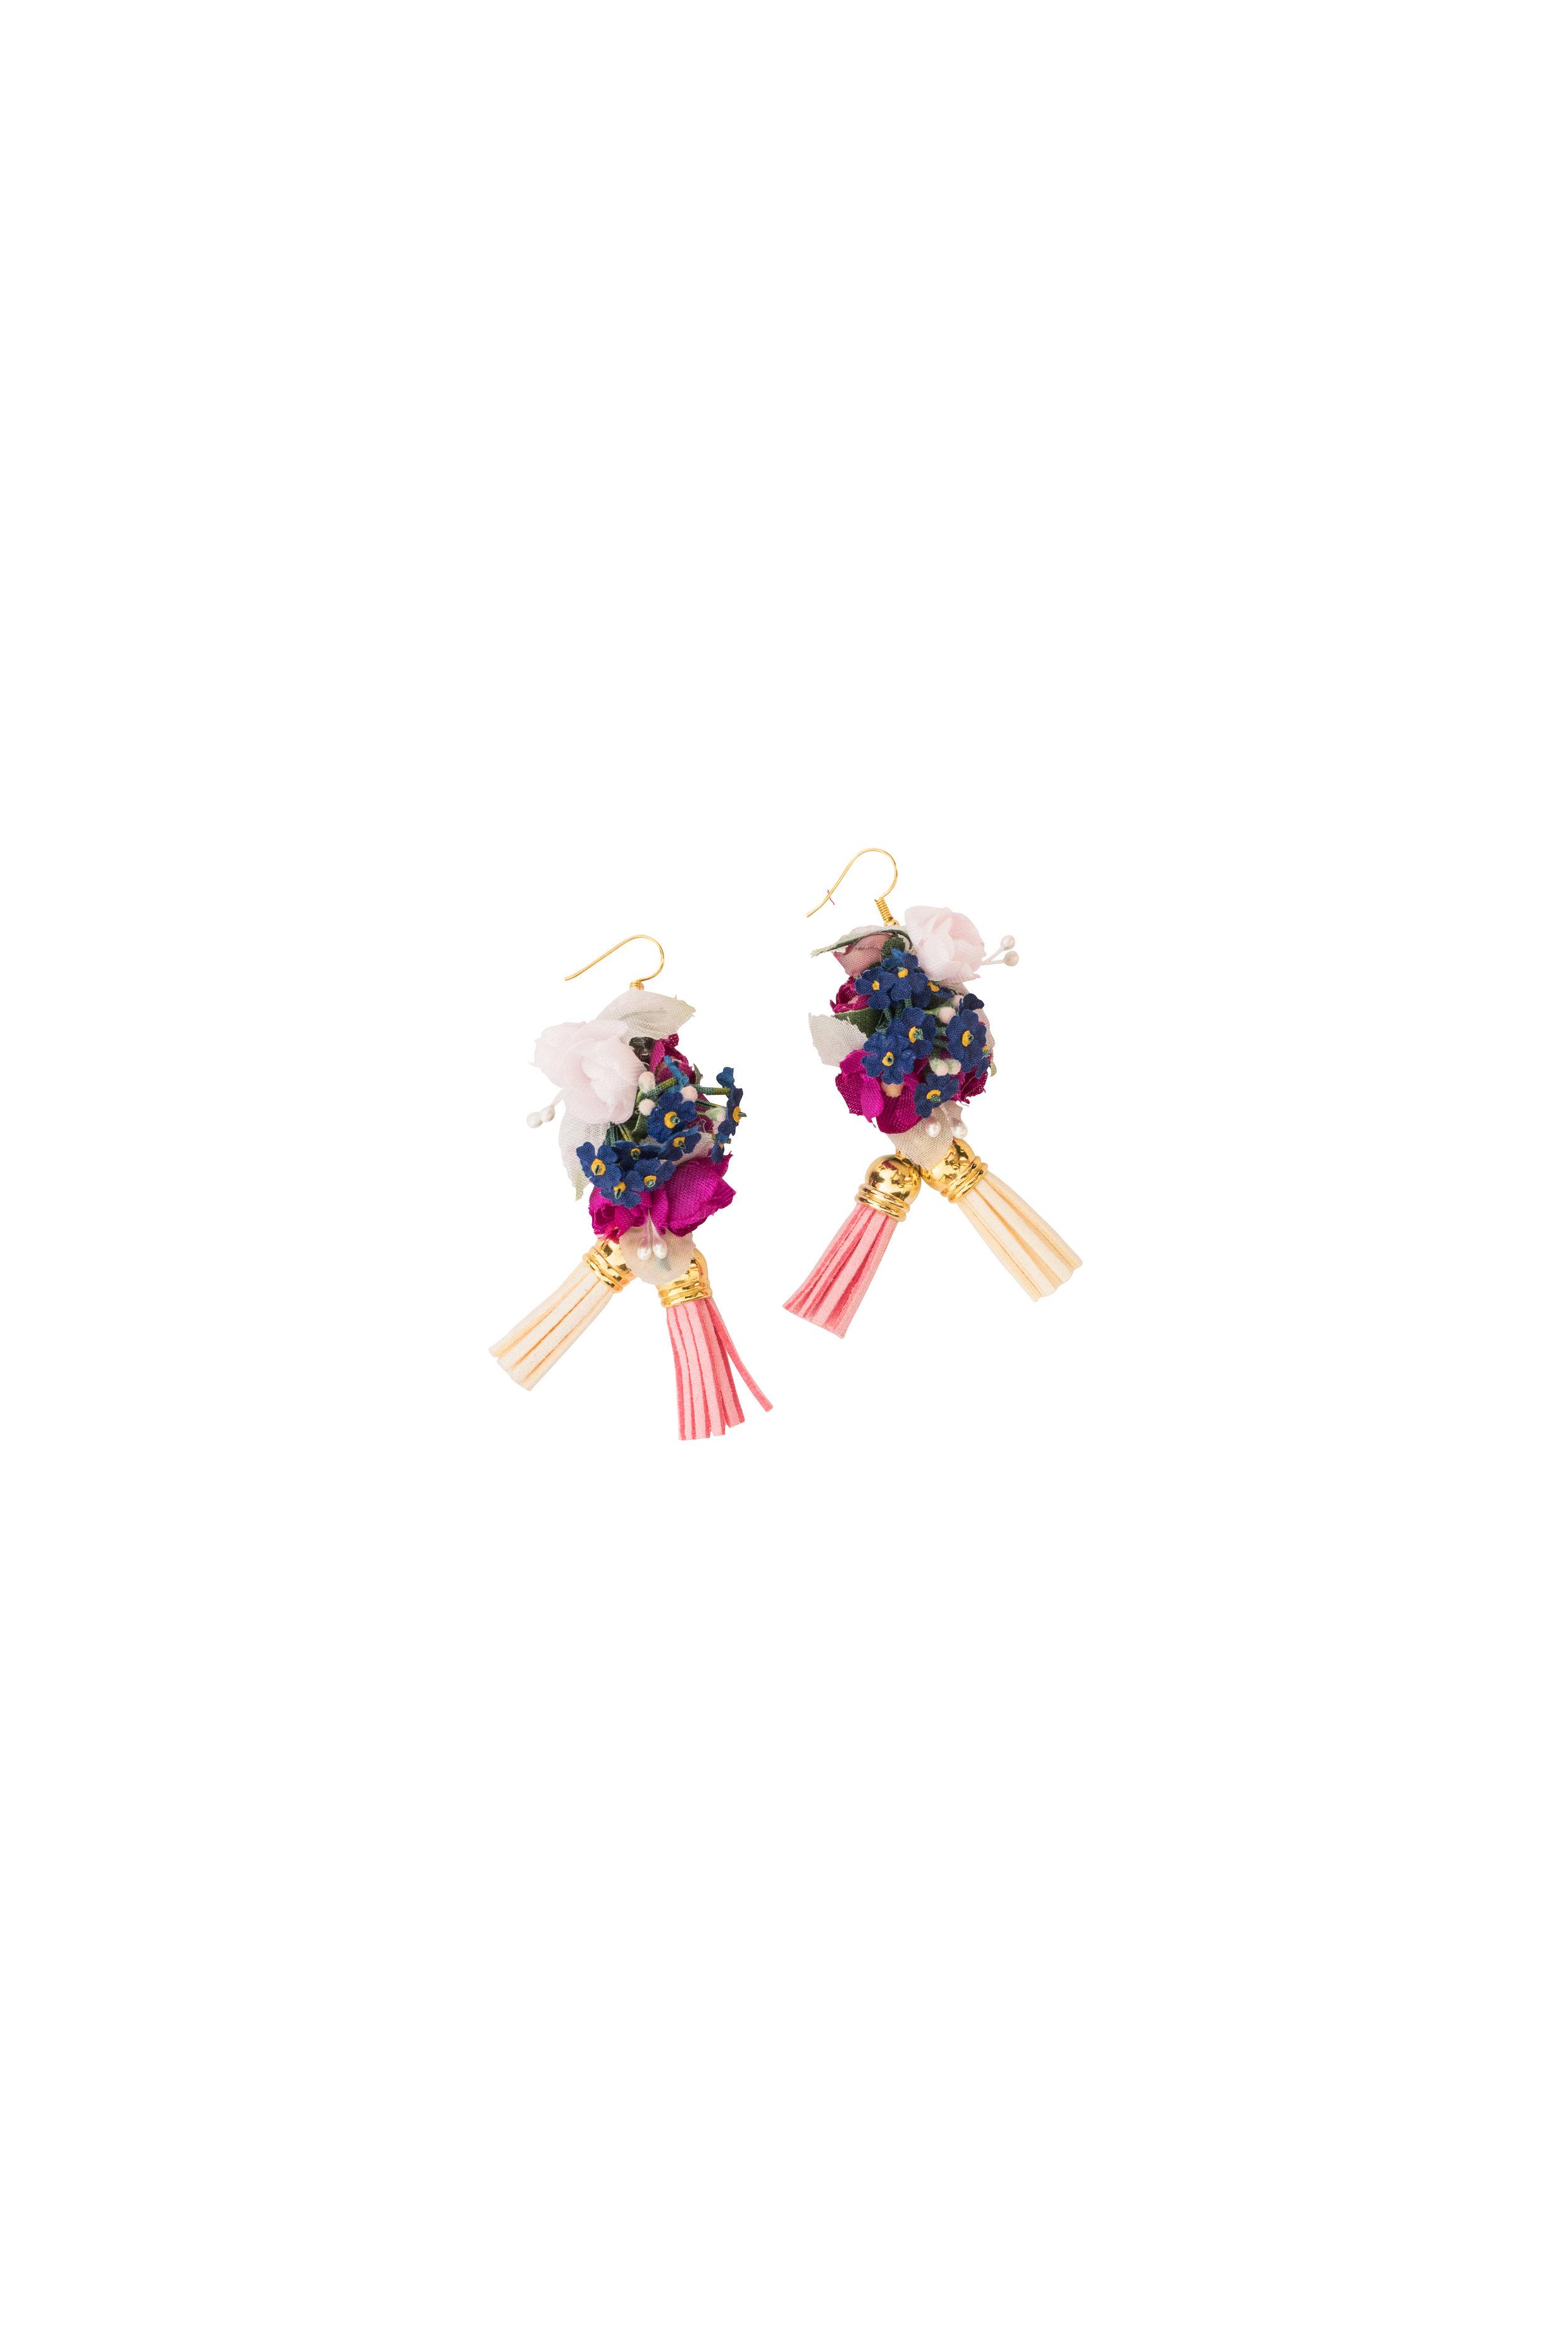 We-Are-Flowergirls-Spring-Summer-Collection-Earring-Tassel-€29[L1140654].jpg